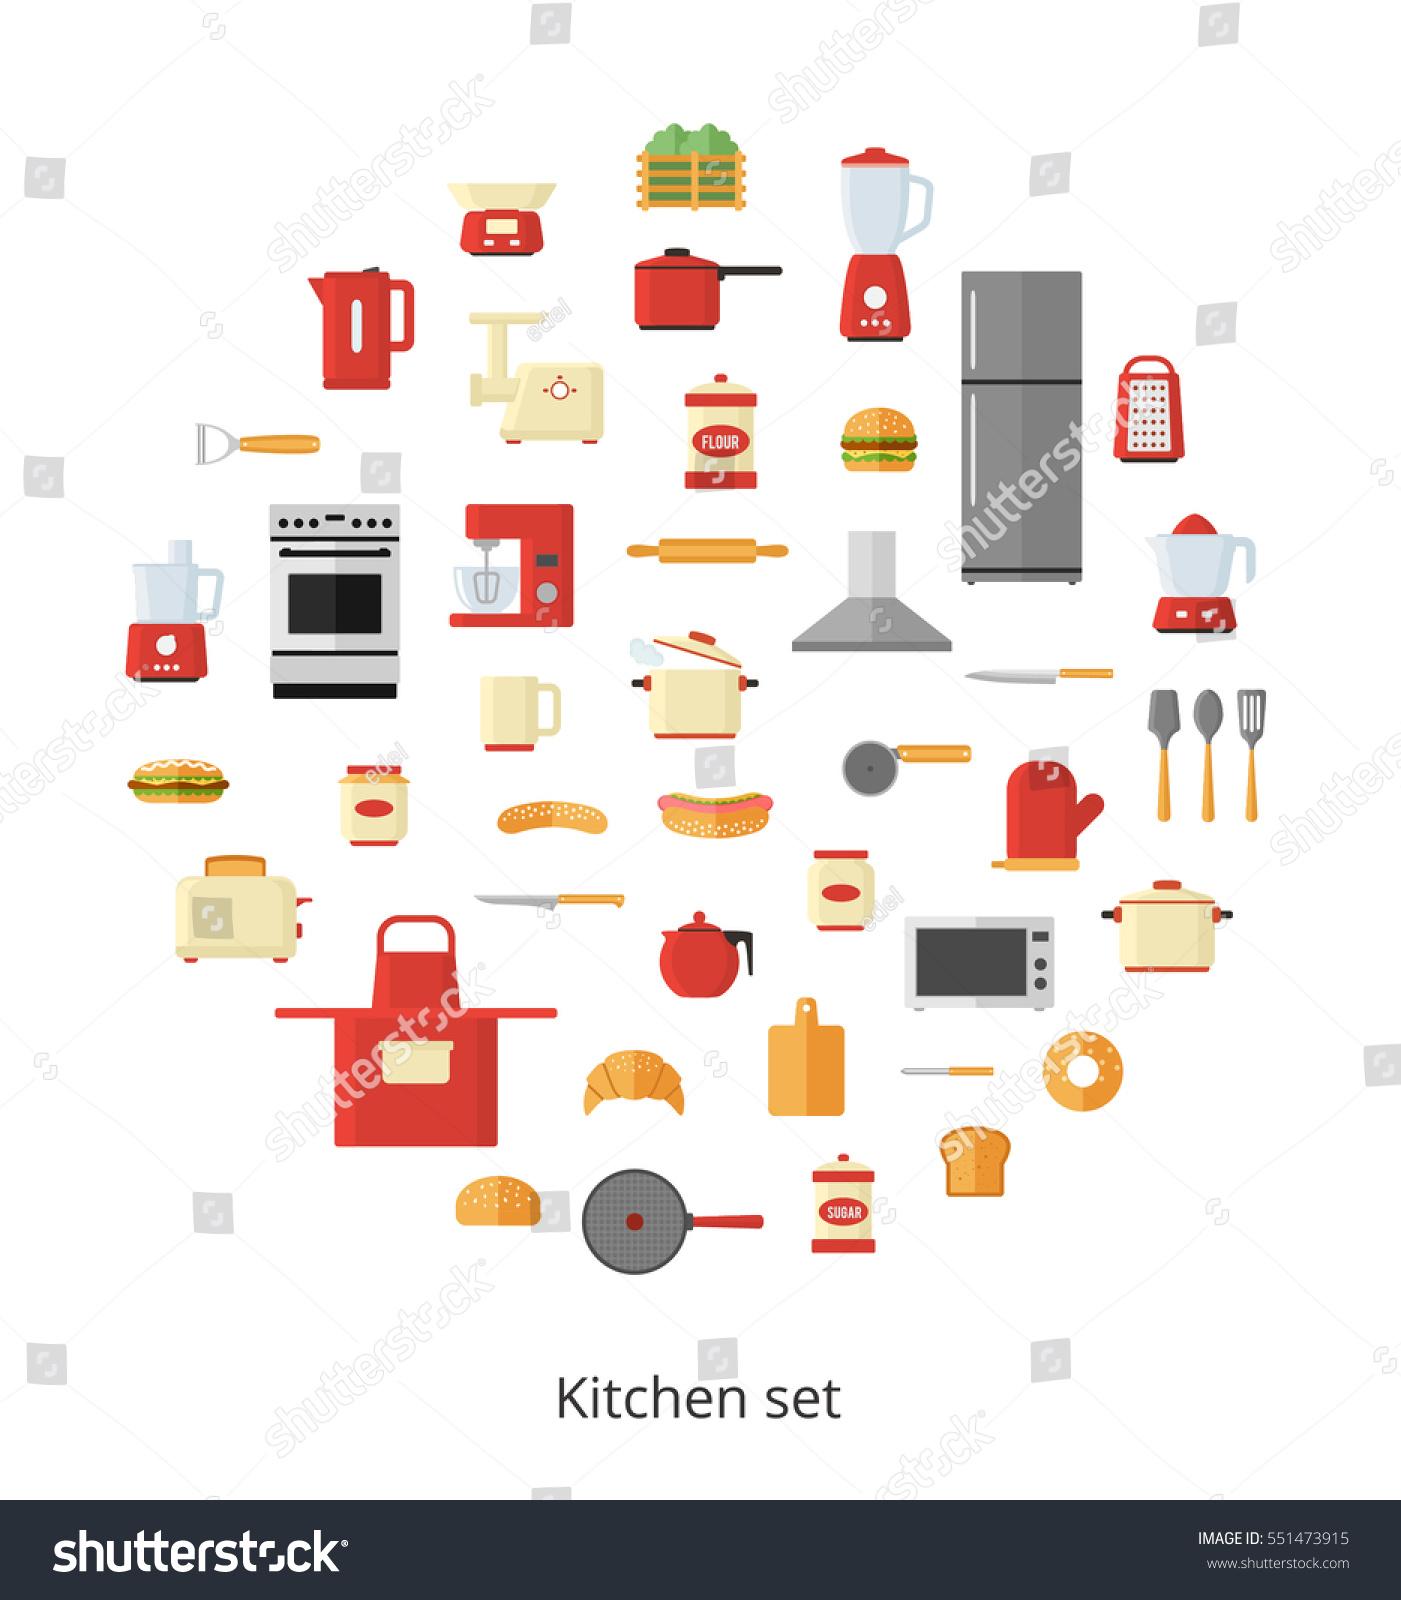 Kitchen Appliances Utensils Electrical Equipment Tools Stock Vector ...